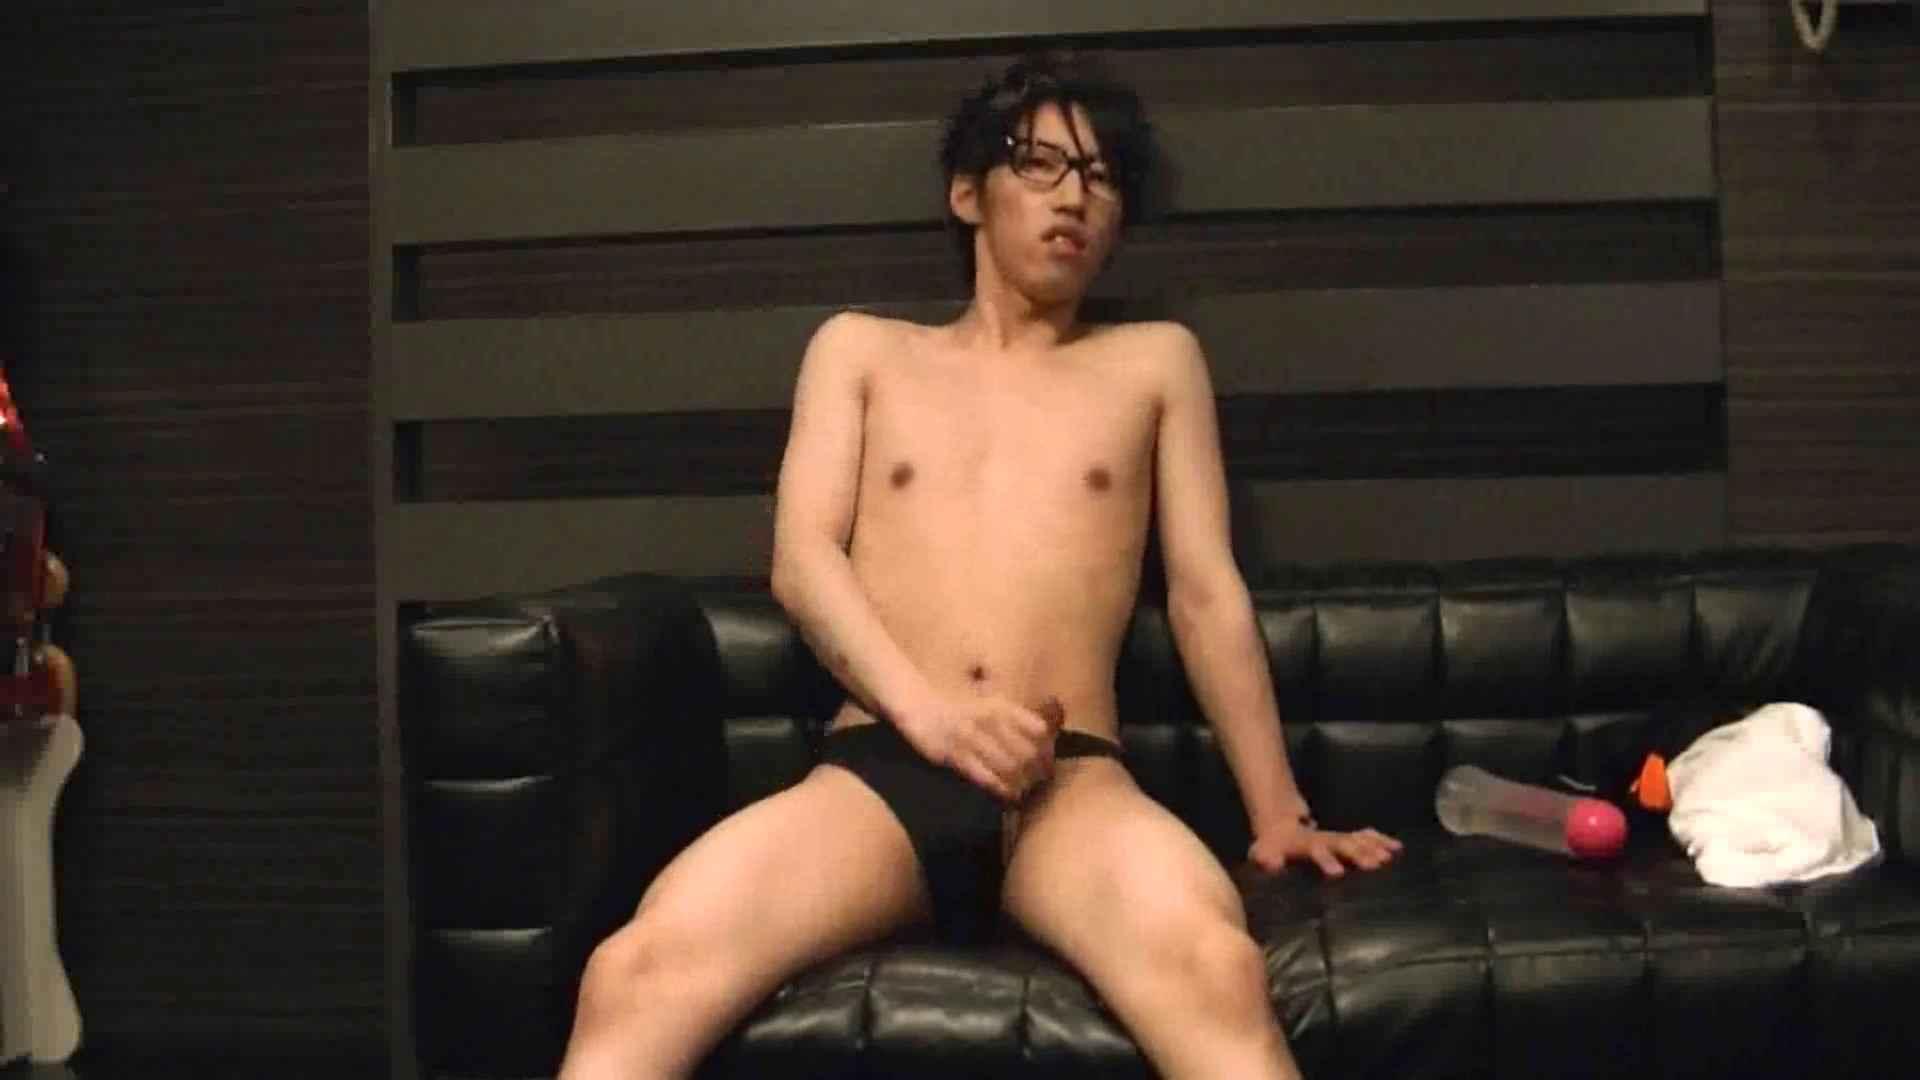 ONA見せカーニバル!! Vol3 男  93pic 57